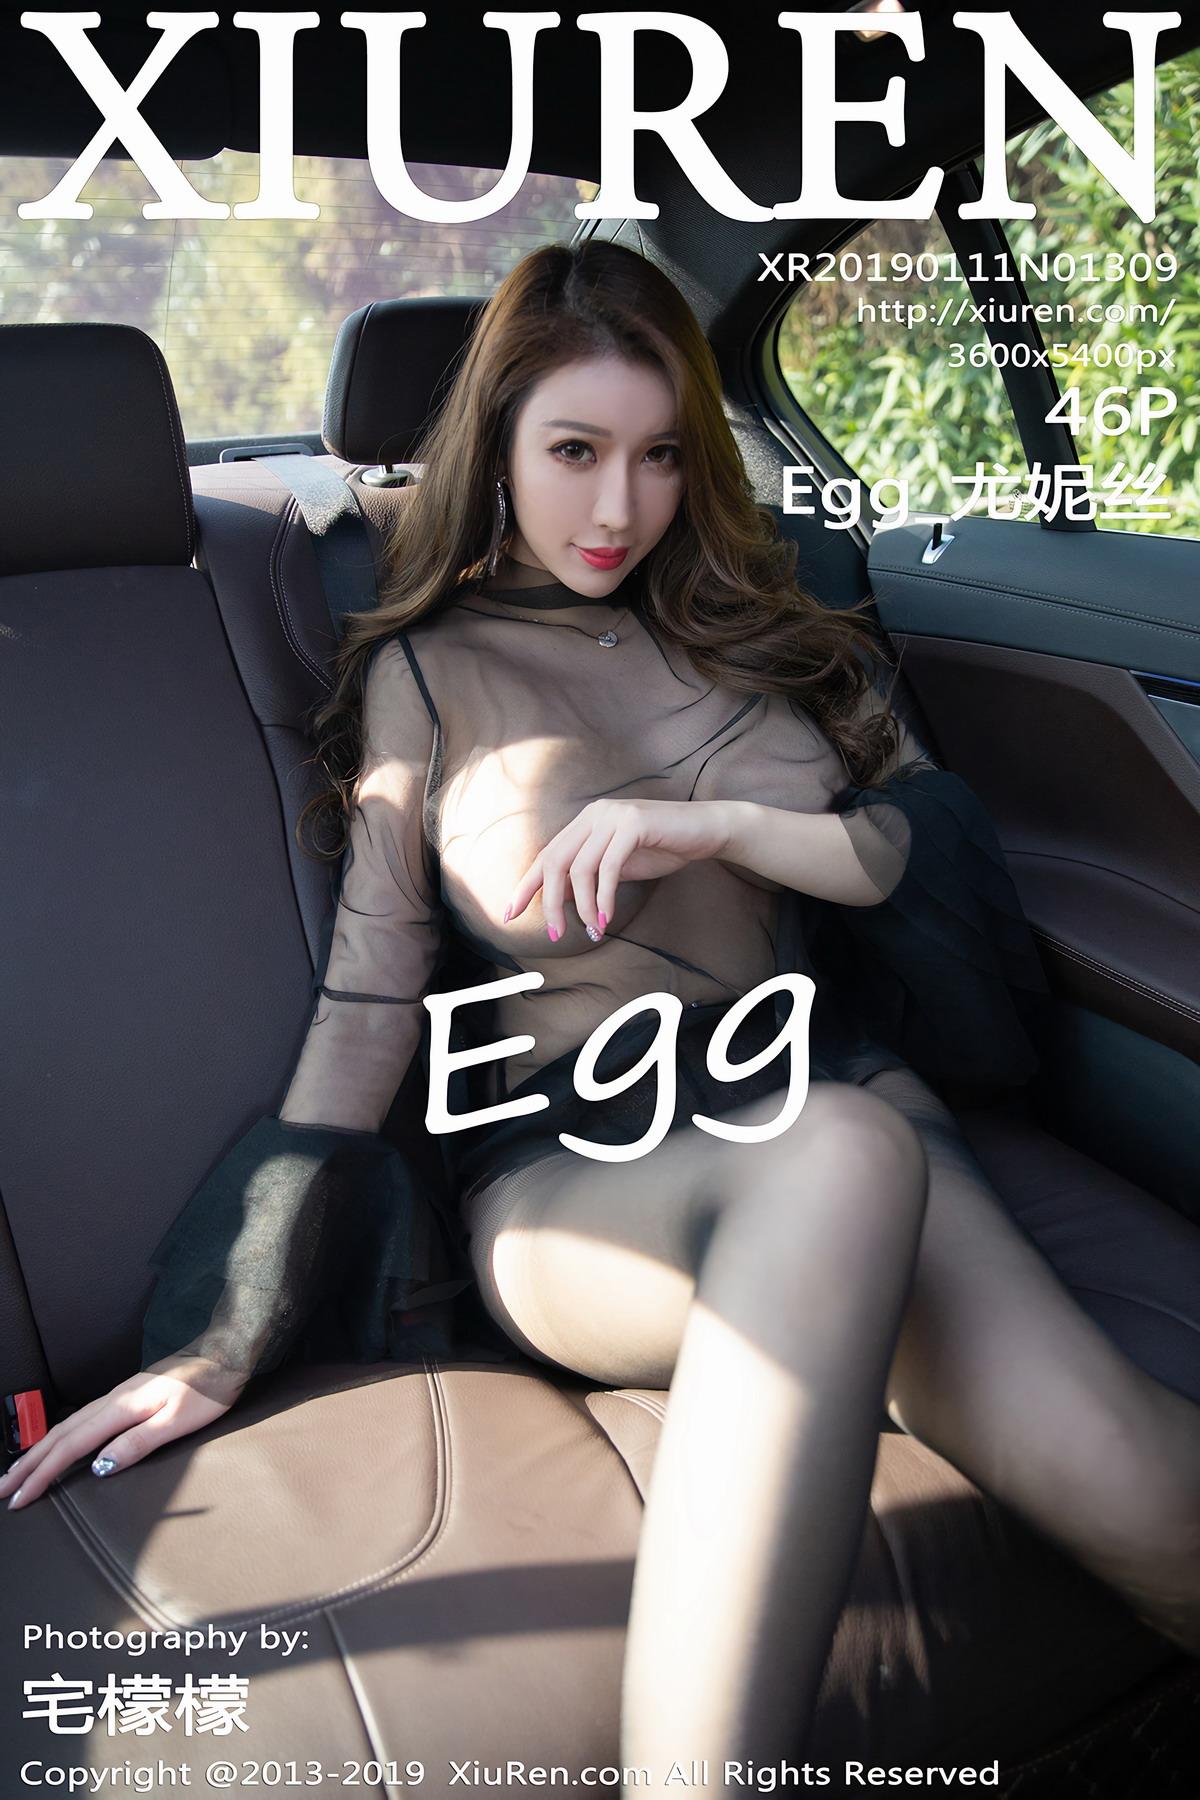 [XiuRen秀人网]2019.01.11 No.1309 Egg_尤妮丝[/170MB]